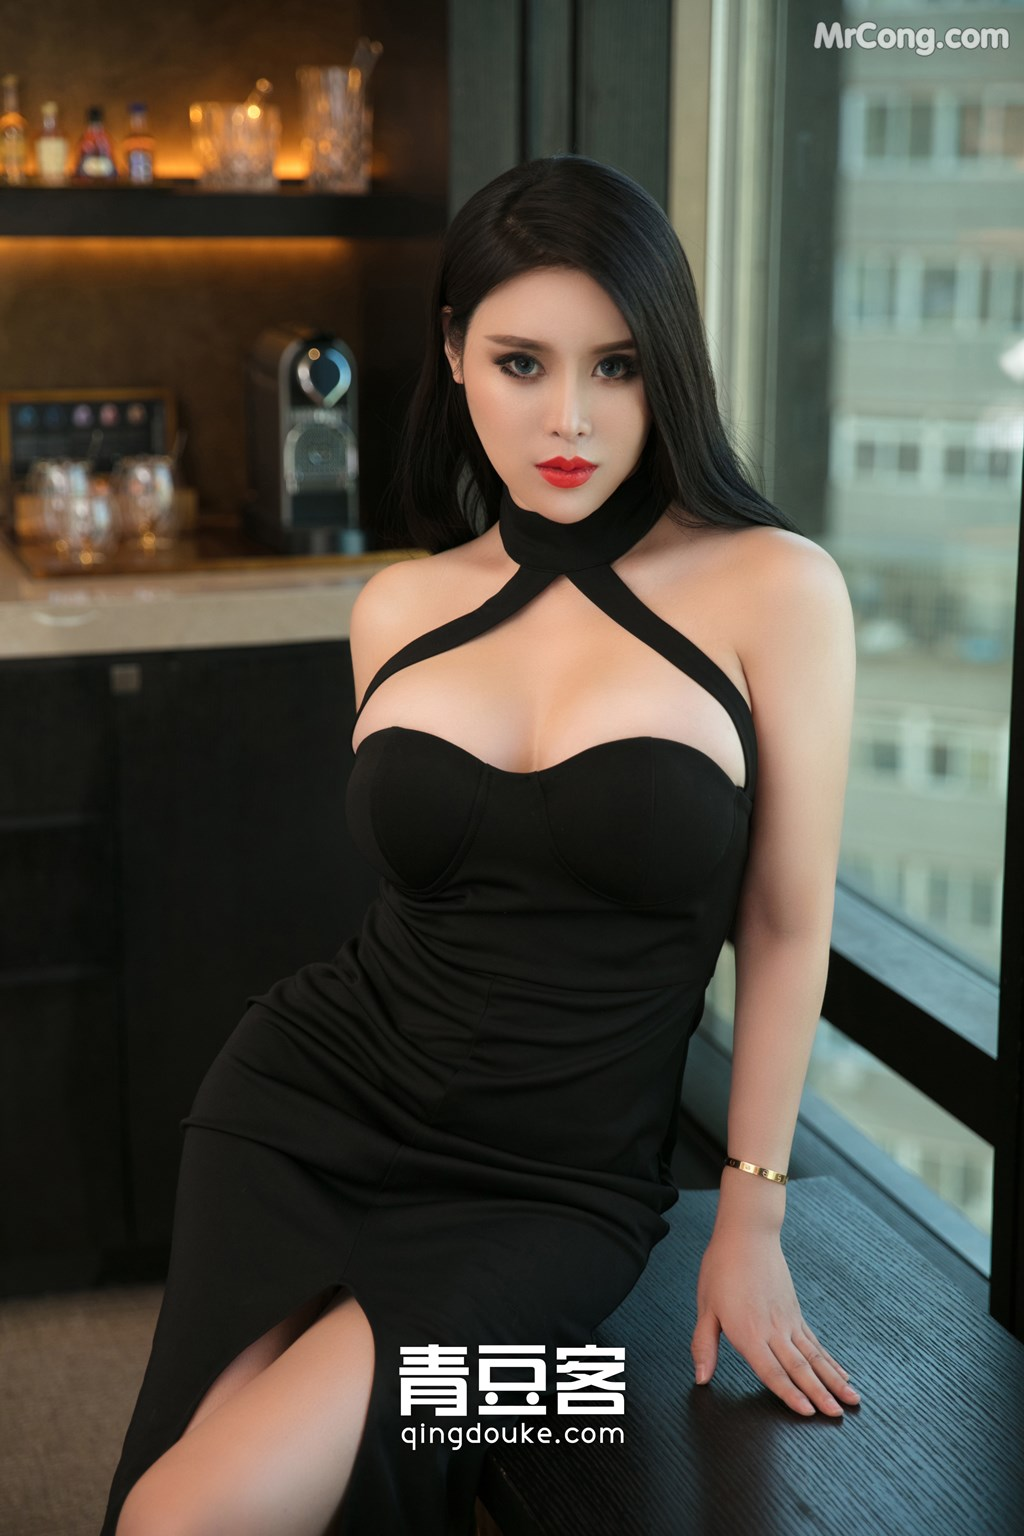 Image QingDouKe-2017-11-05-Ke-Rui-Na-MrCong.com-002 in post QingDouKe 2017-11-05: Người mẫu Ke Rui Na (可蕊娜) (48 ảnh)